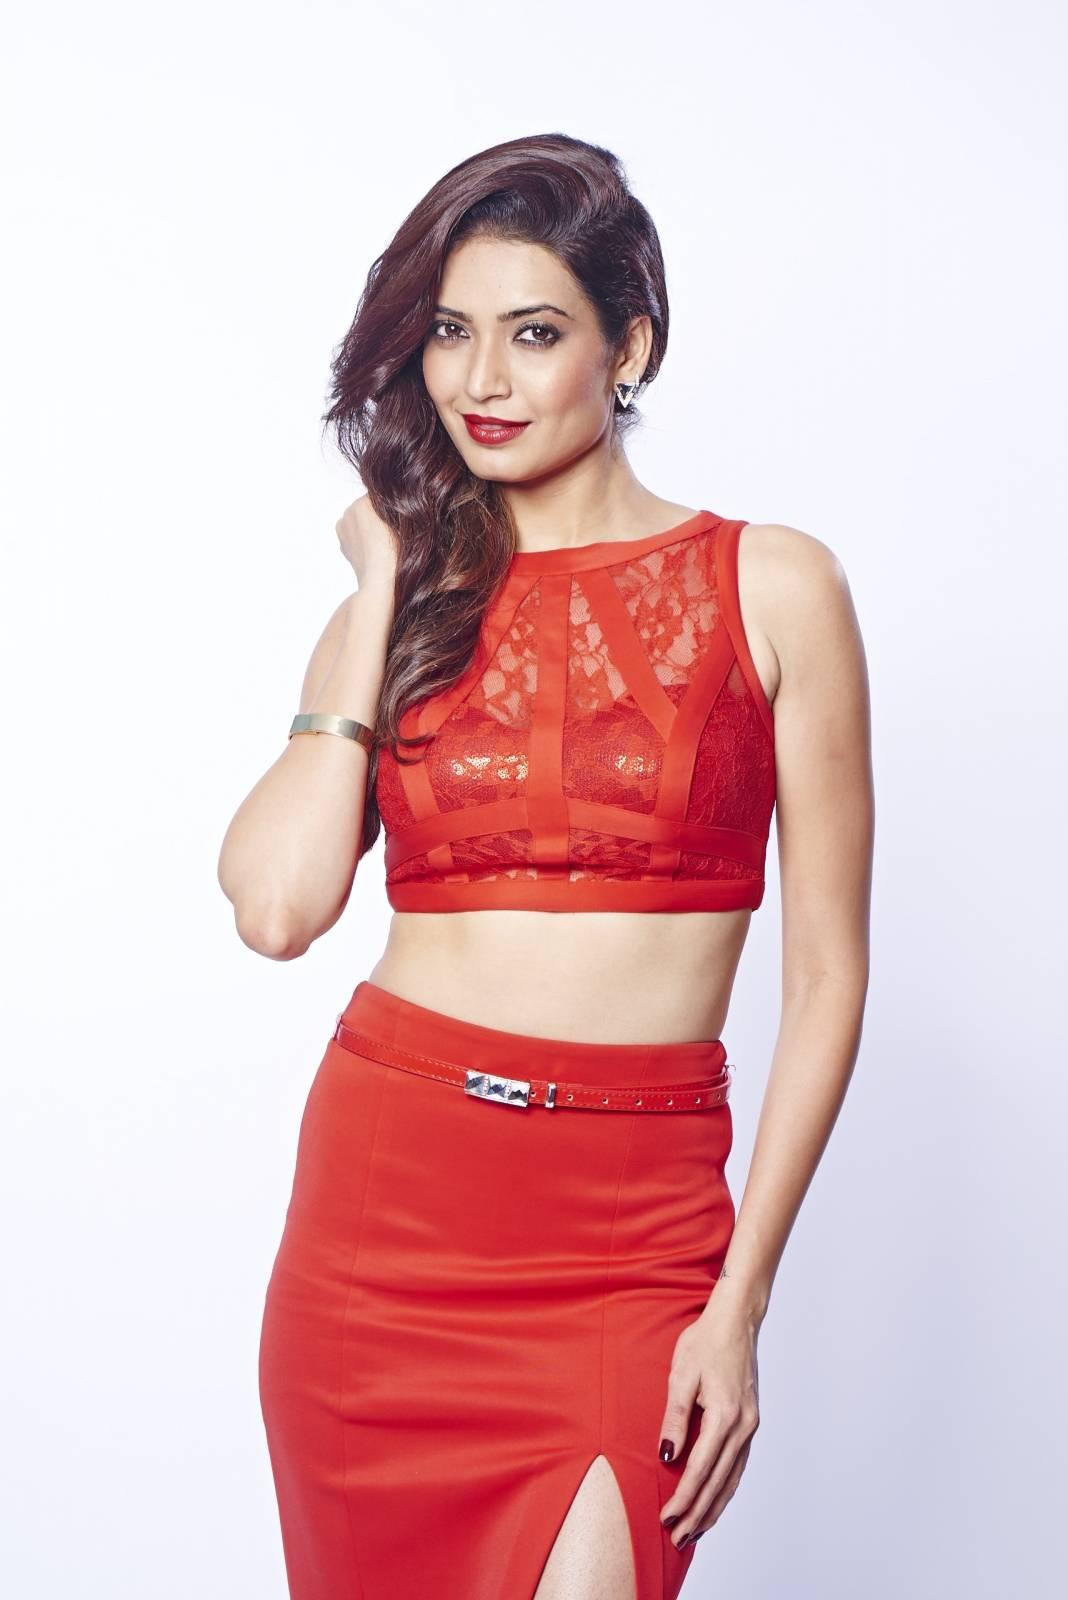 gratis film sider kreena Kapoor sexy video